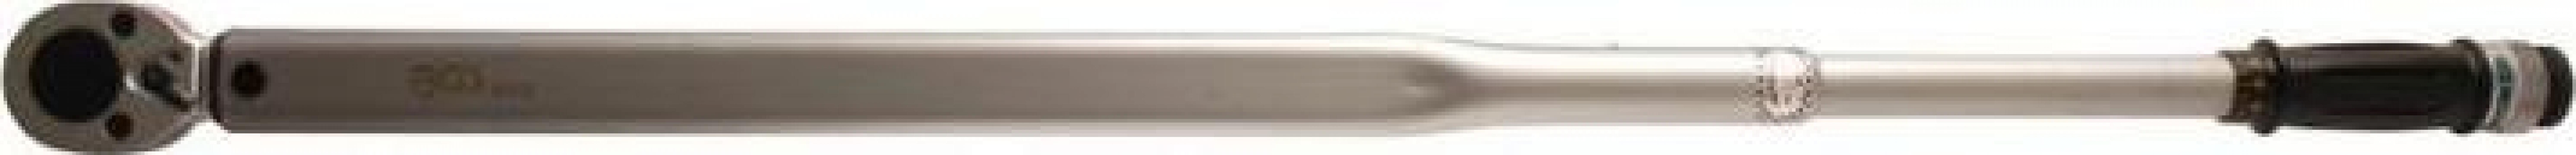 "Cheie dinamometrica de atelier, 3/4"", 140-980 Nm, BGS990"